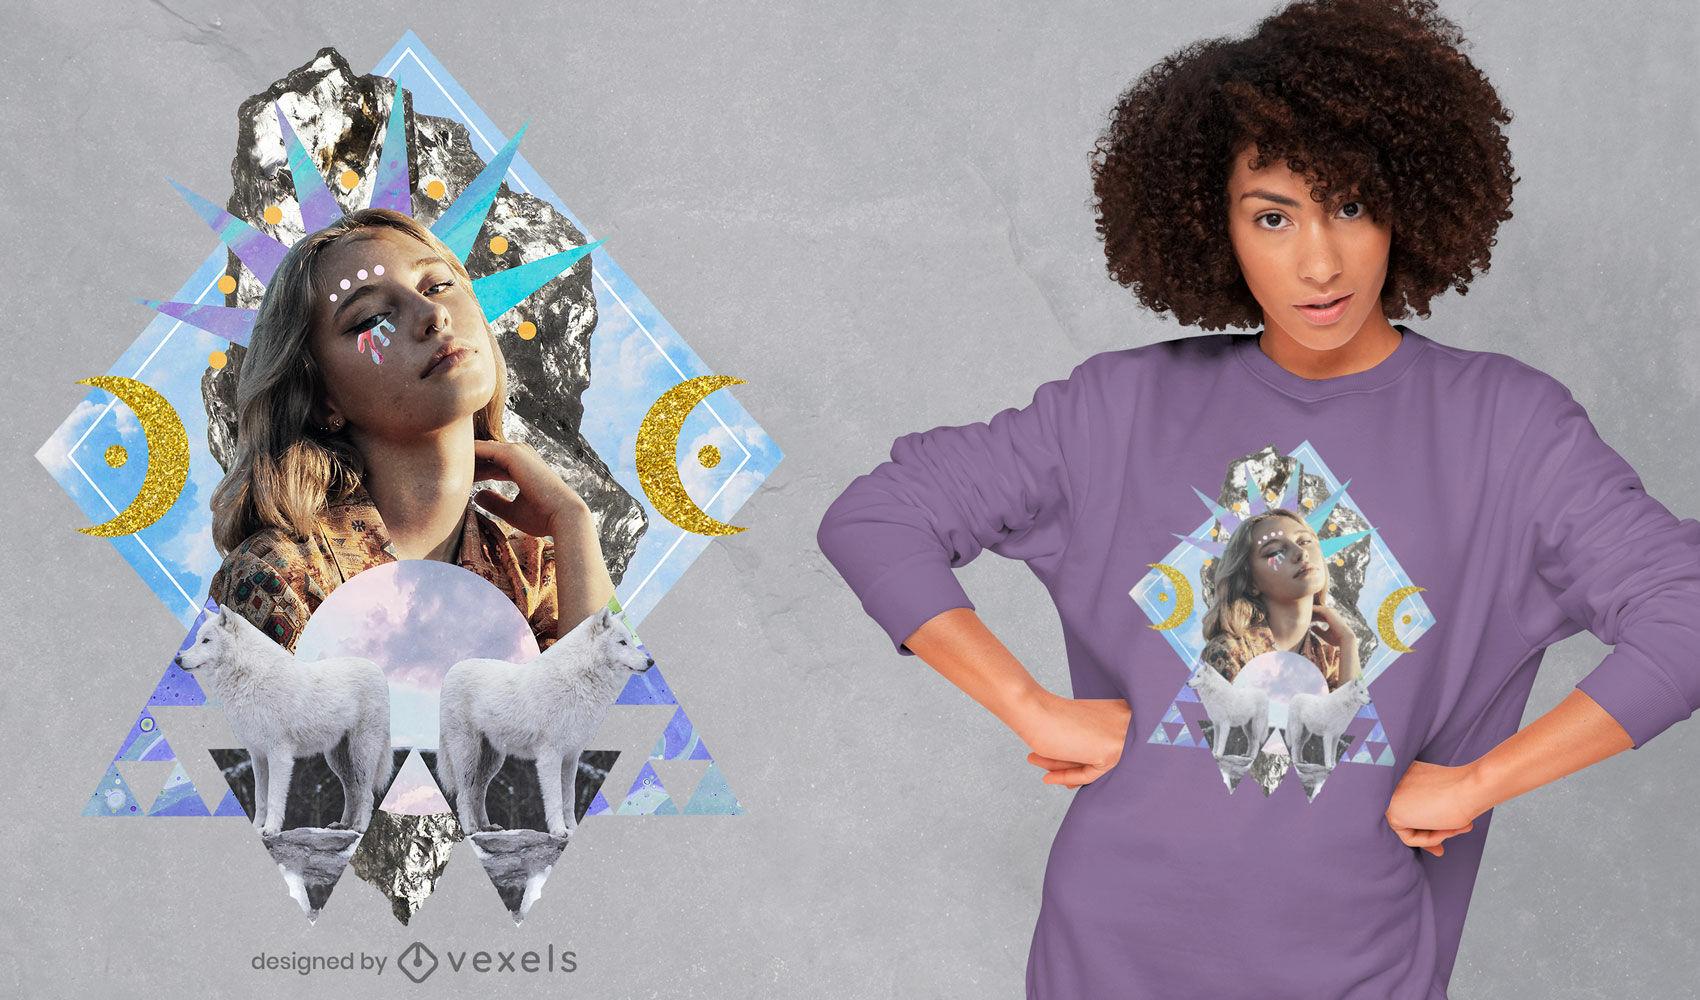 Mystical fantasy collage t-shirt psd